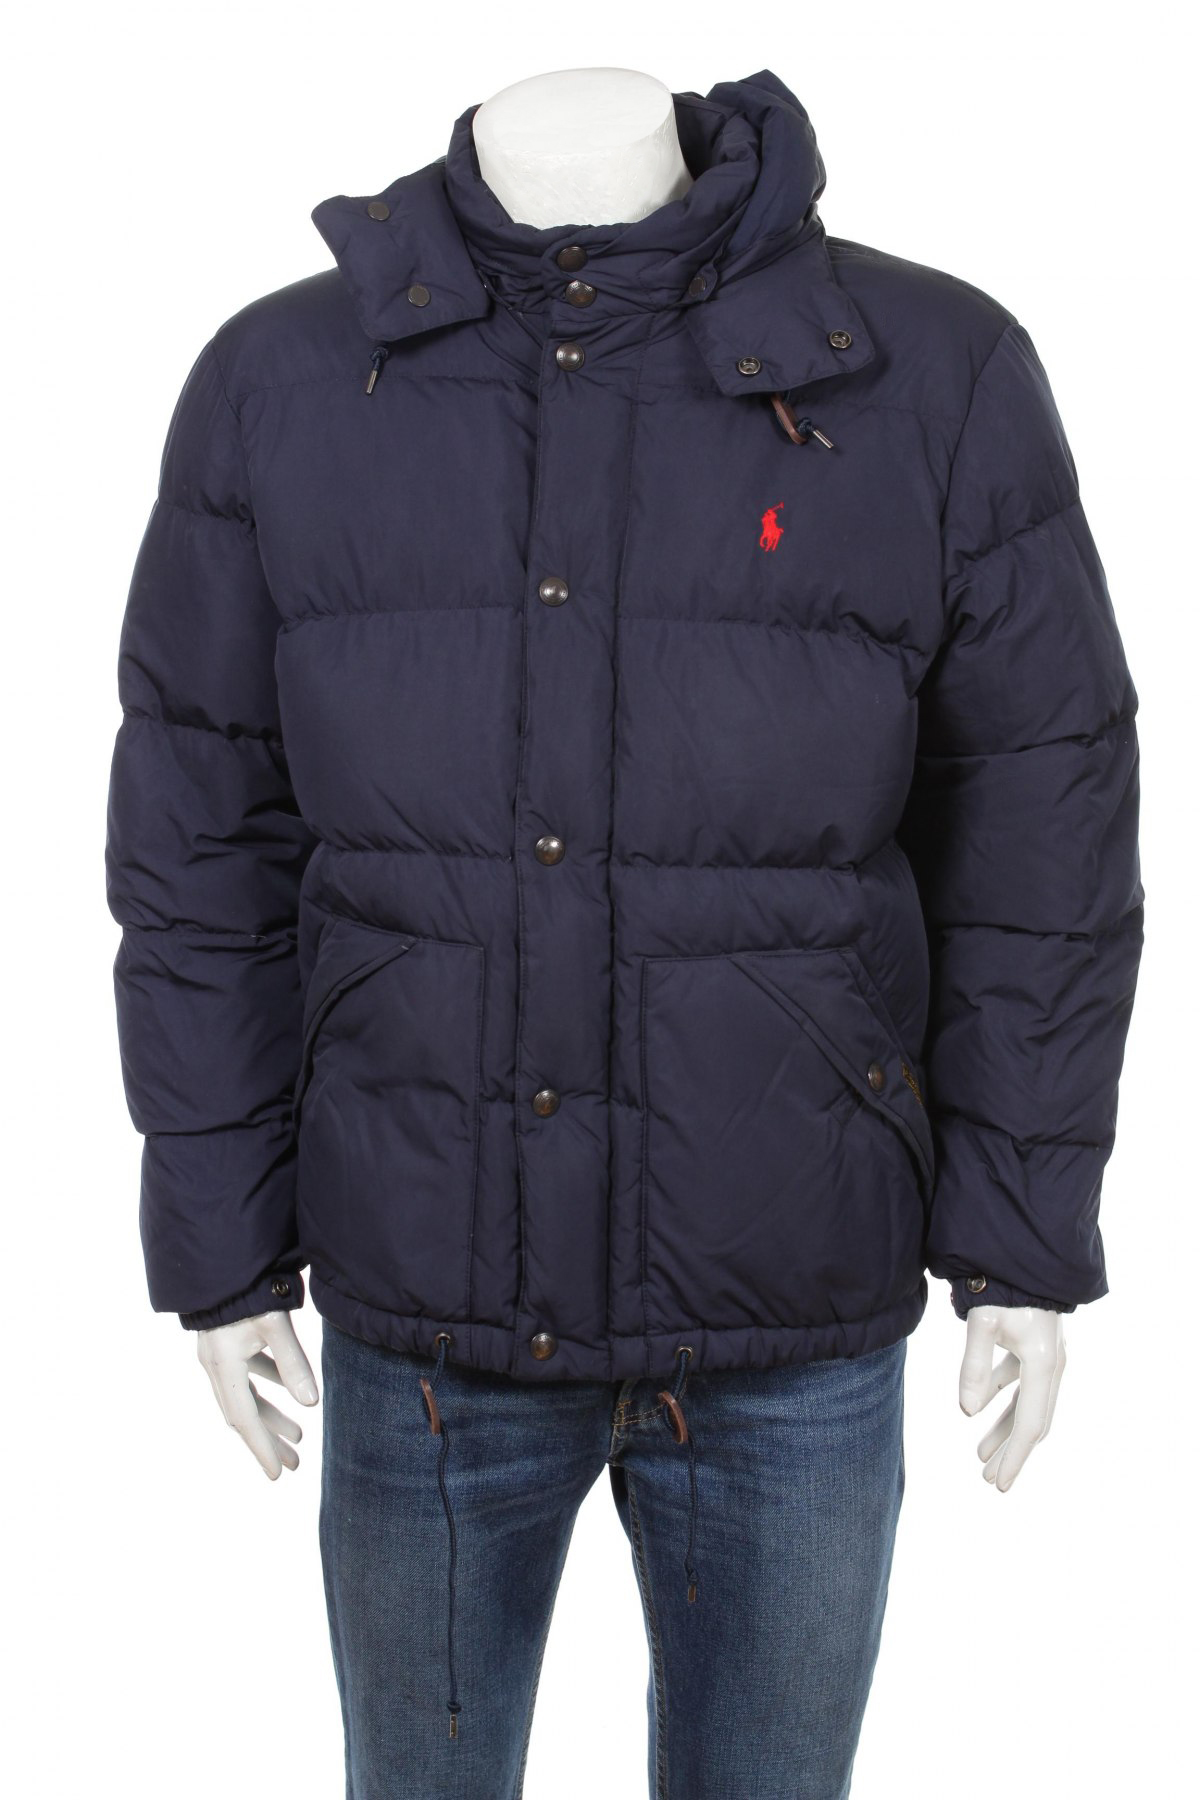 Polo Ralph Lauren Mens Elmwood Down Quilted Winter Puffer Jacket Blue